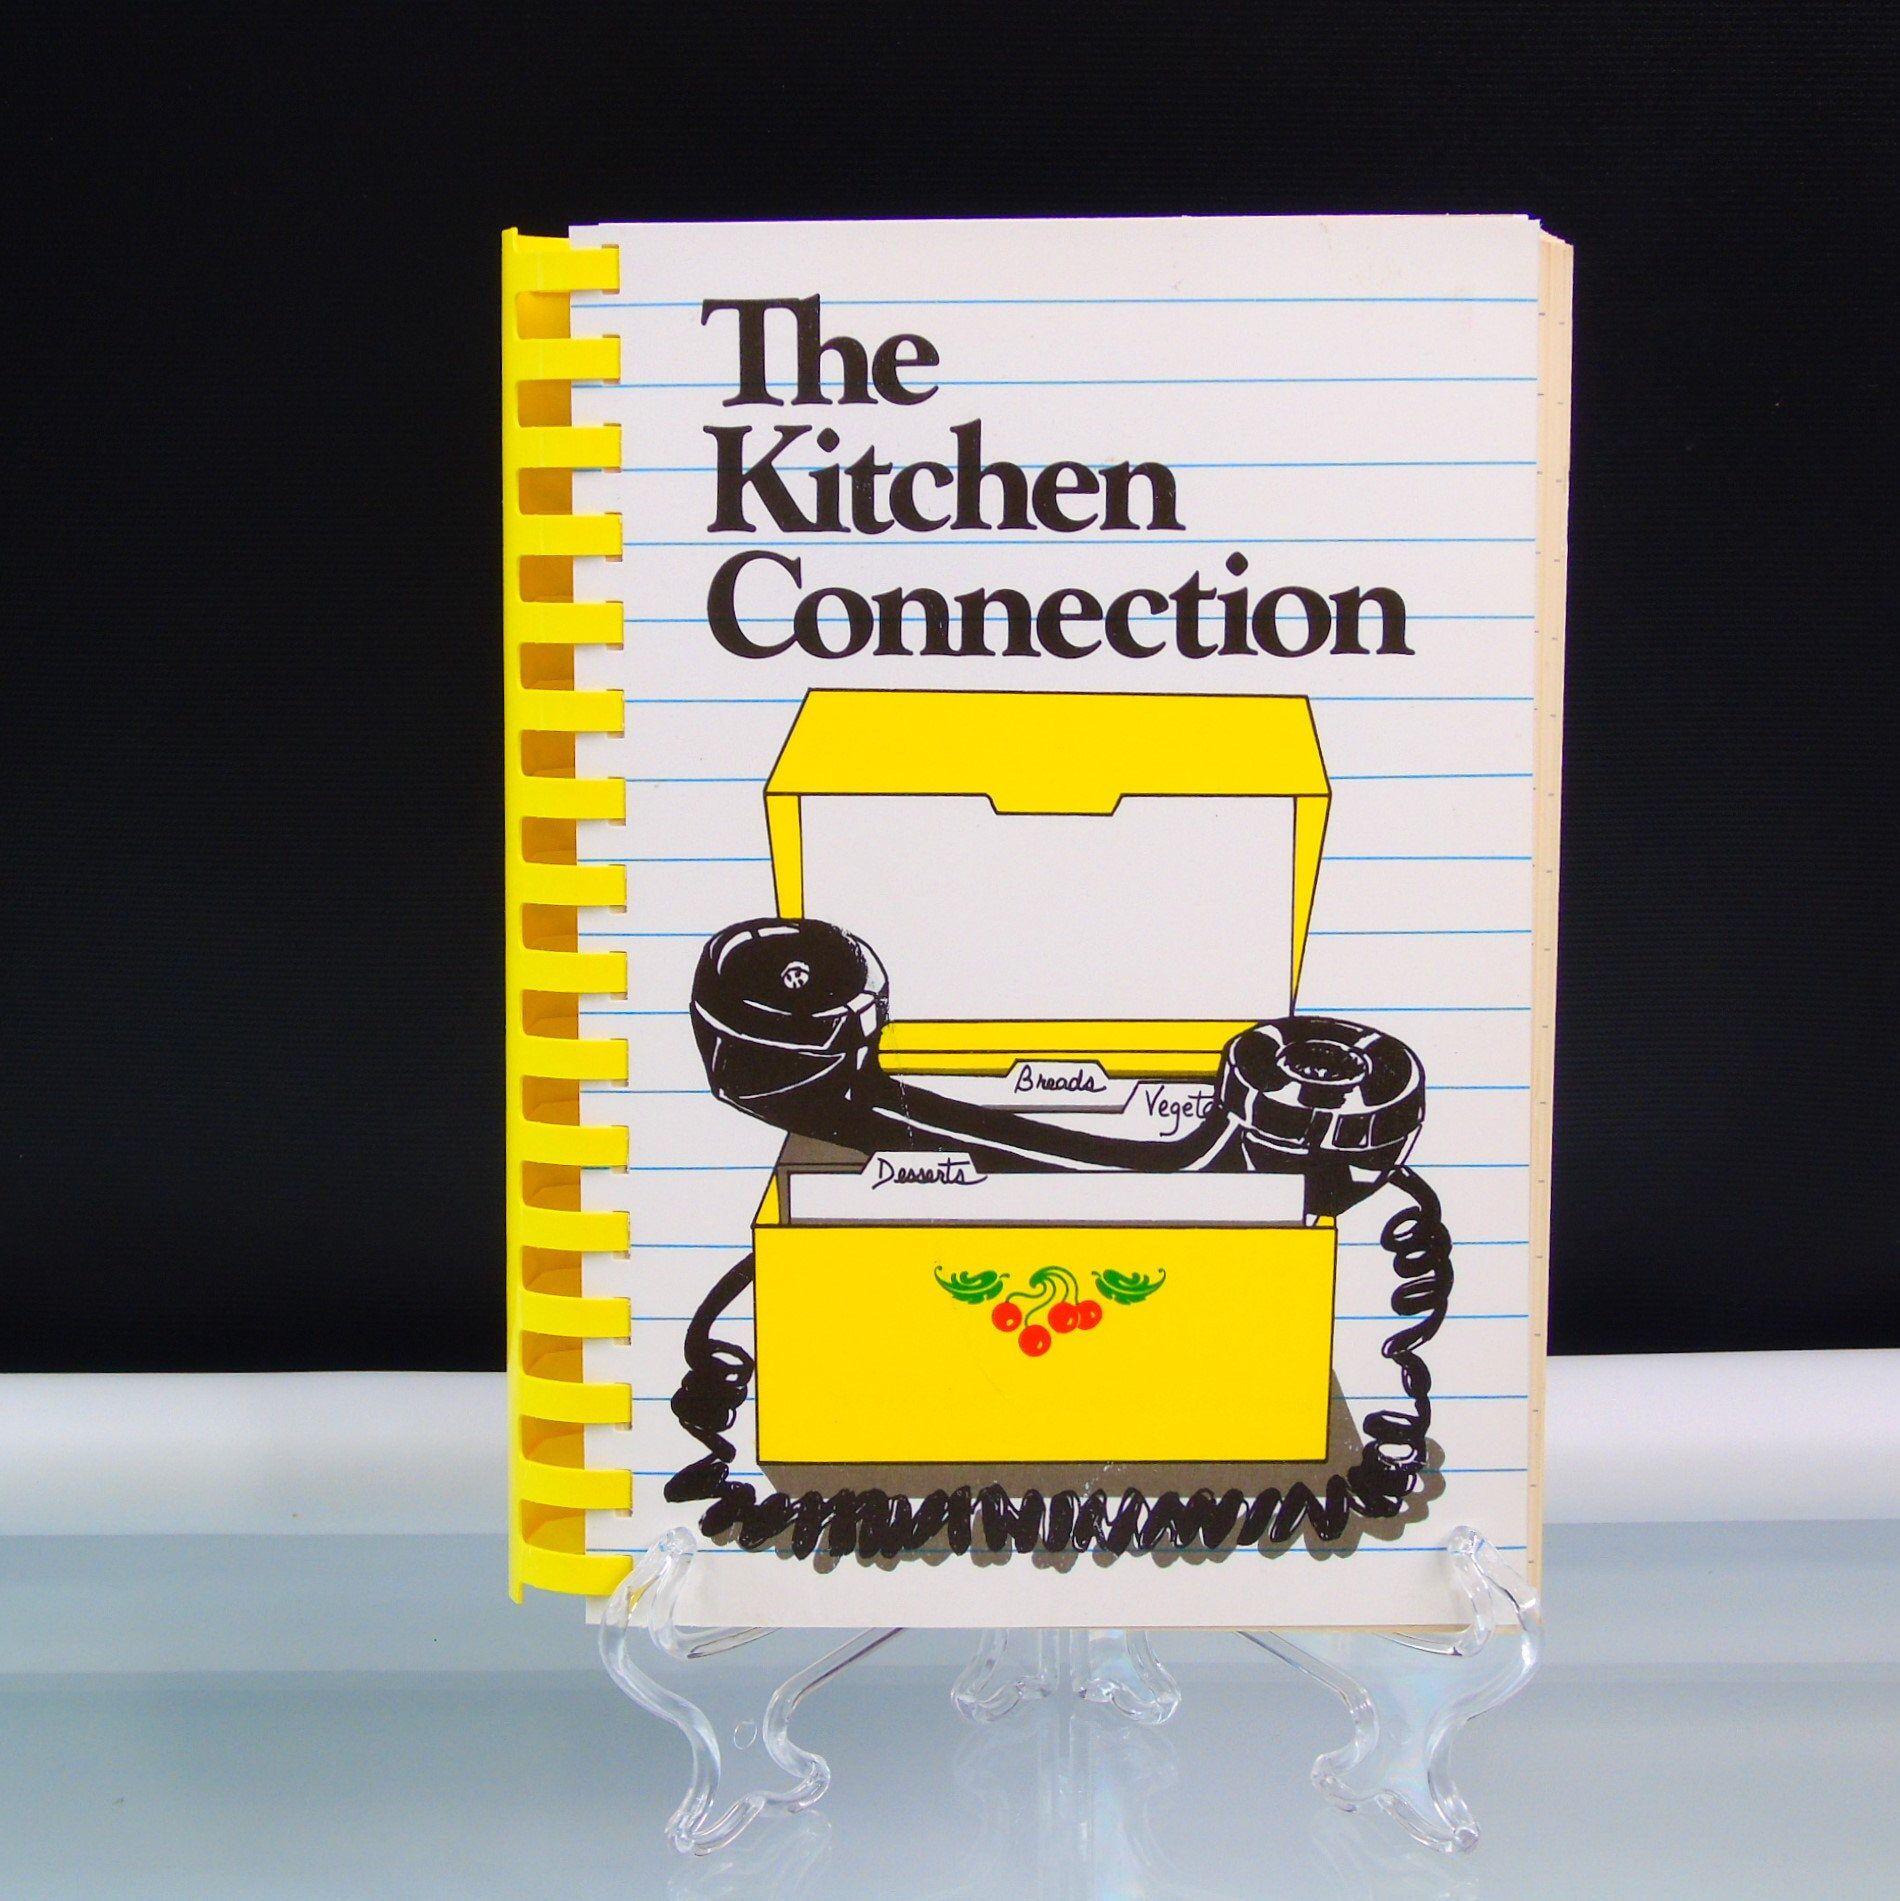 e7c715b184db6b9addfa8cd02731b887 - Better Homes And Gardens New Cookbook 15th Edition